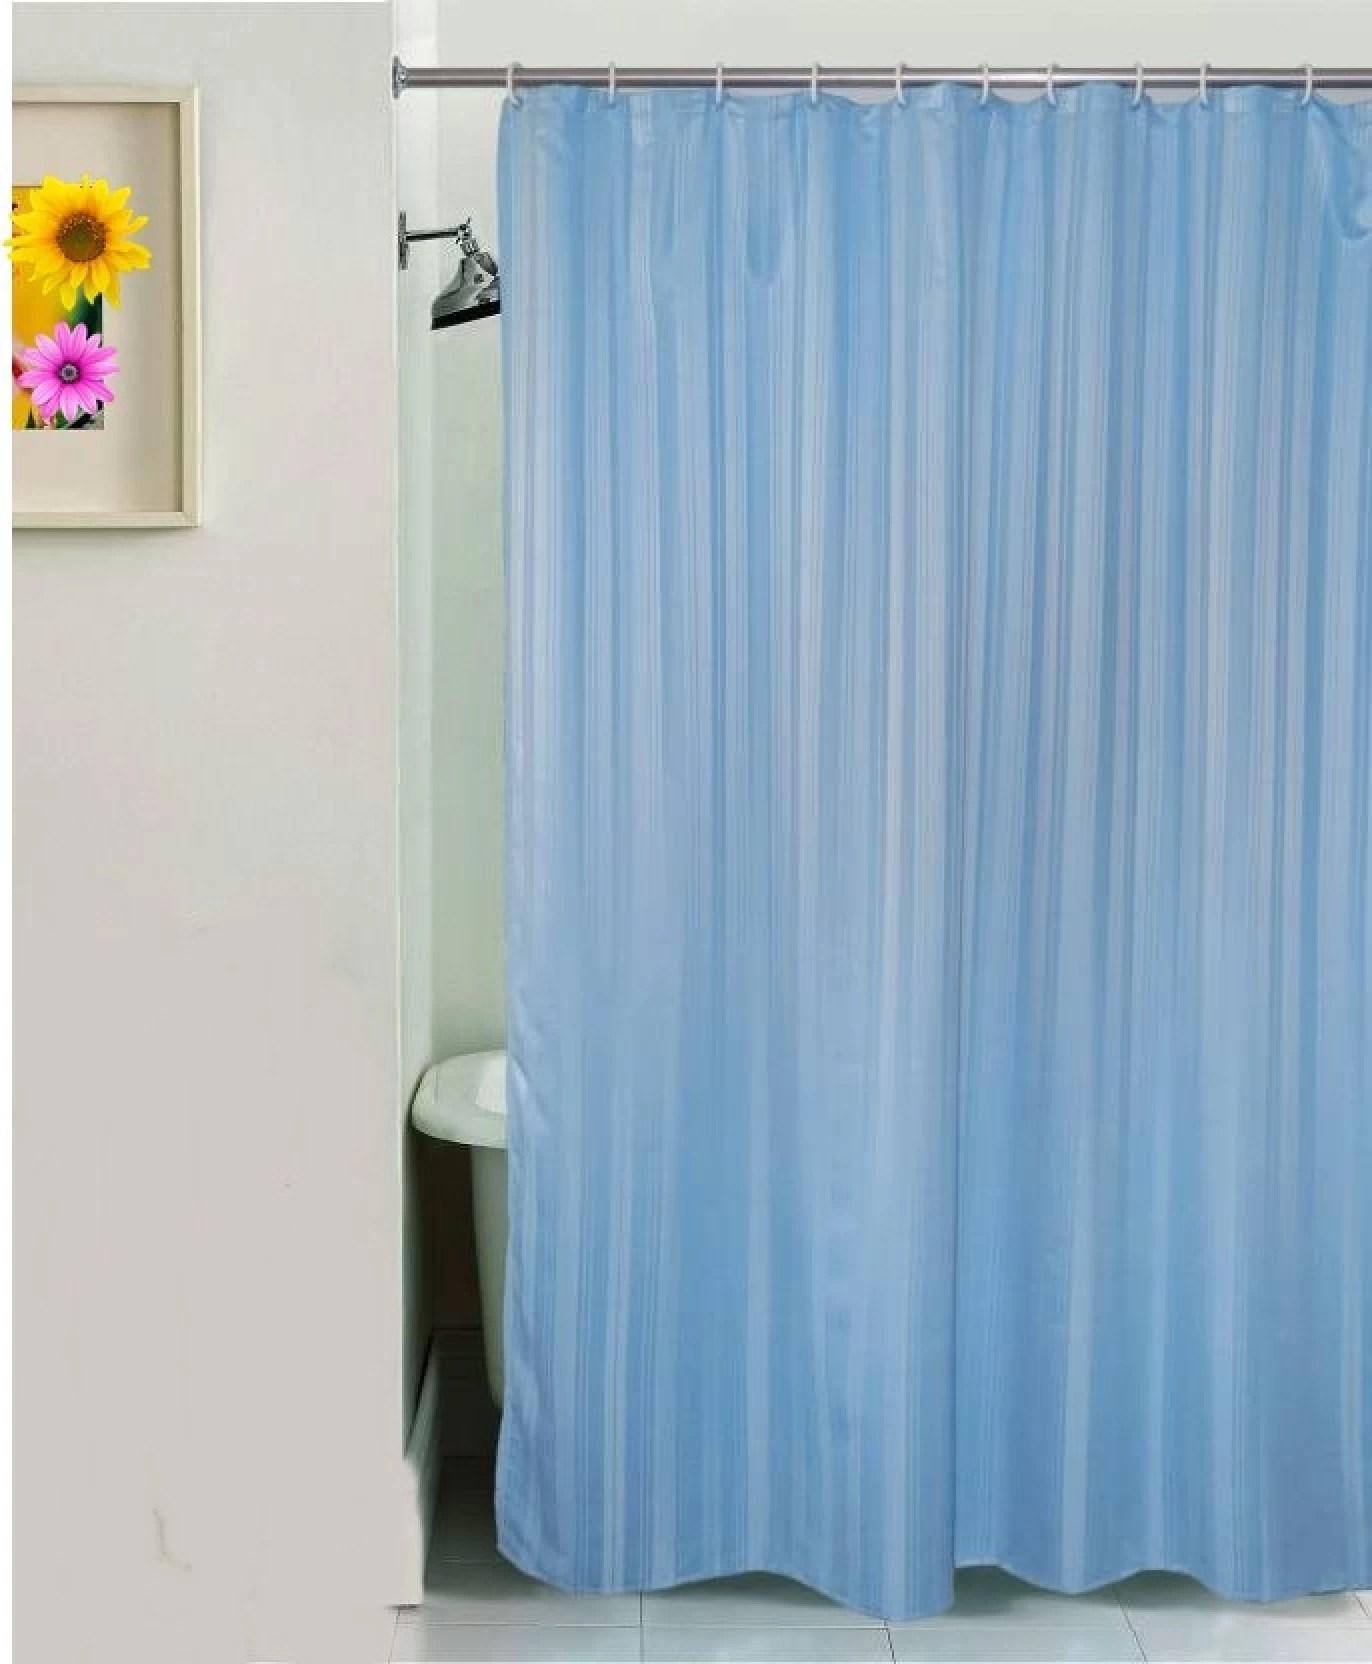 Yellow Weaves 213 Cm 7 Ft Pvc Shower Curtain Single Curtain